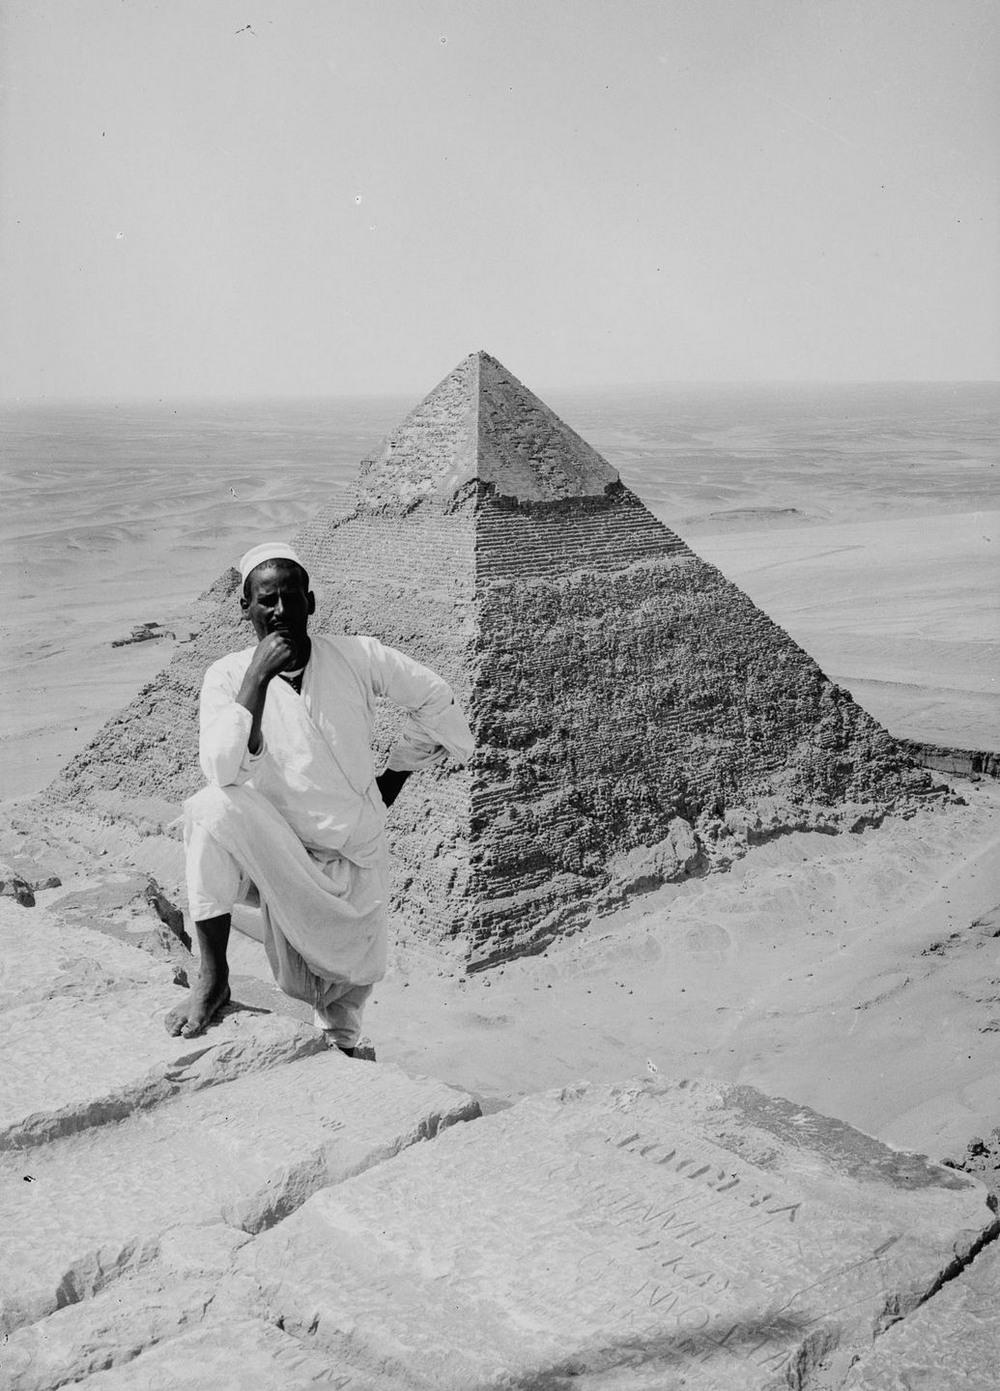 retro-foto-turistov-na-piramidah-Gizy_19